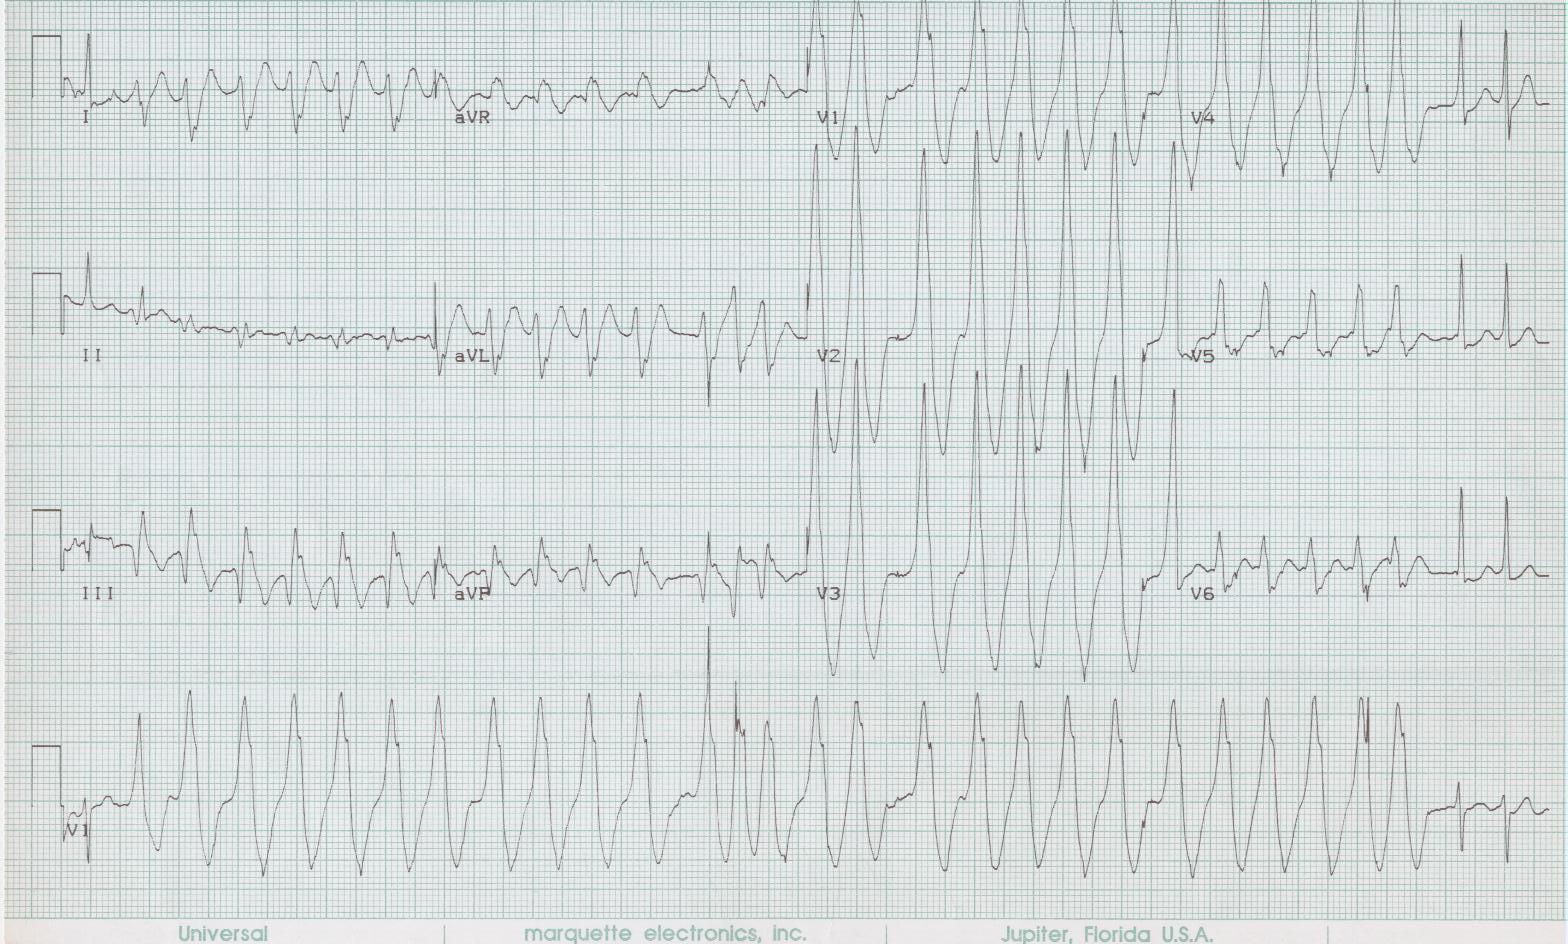 18 - Atrial fib via bypass tract (WPW)